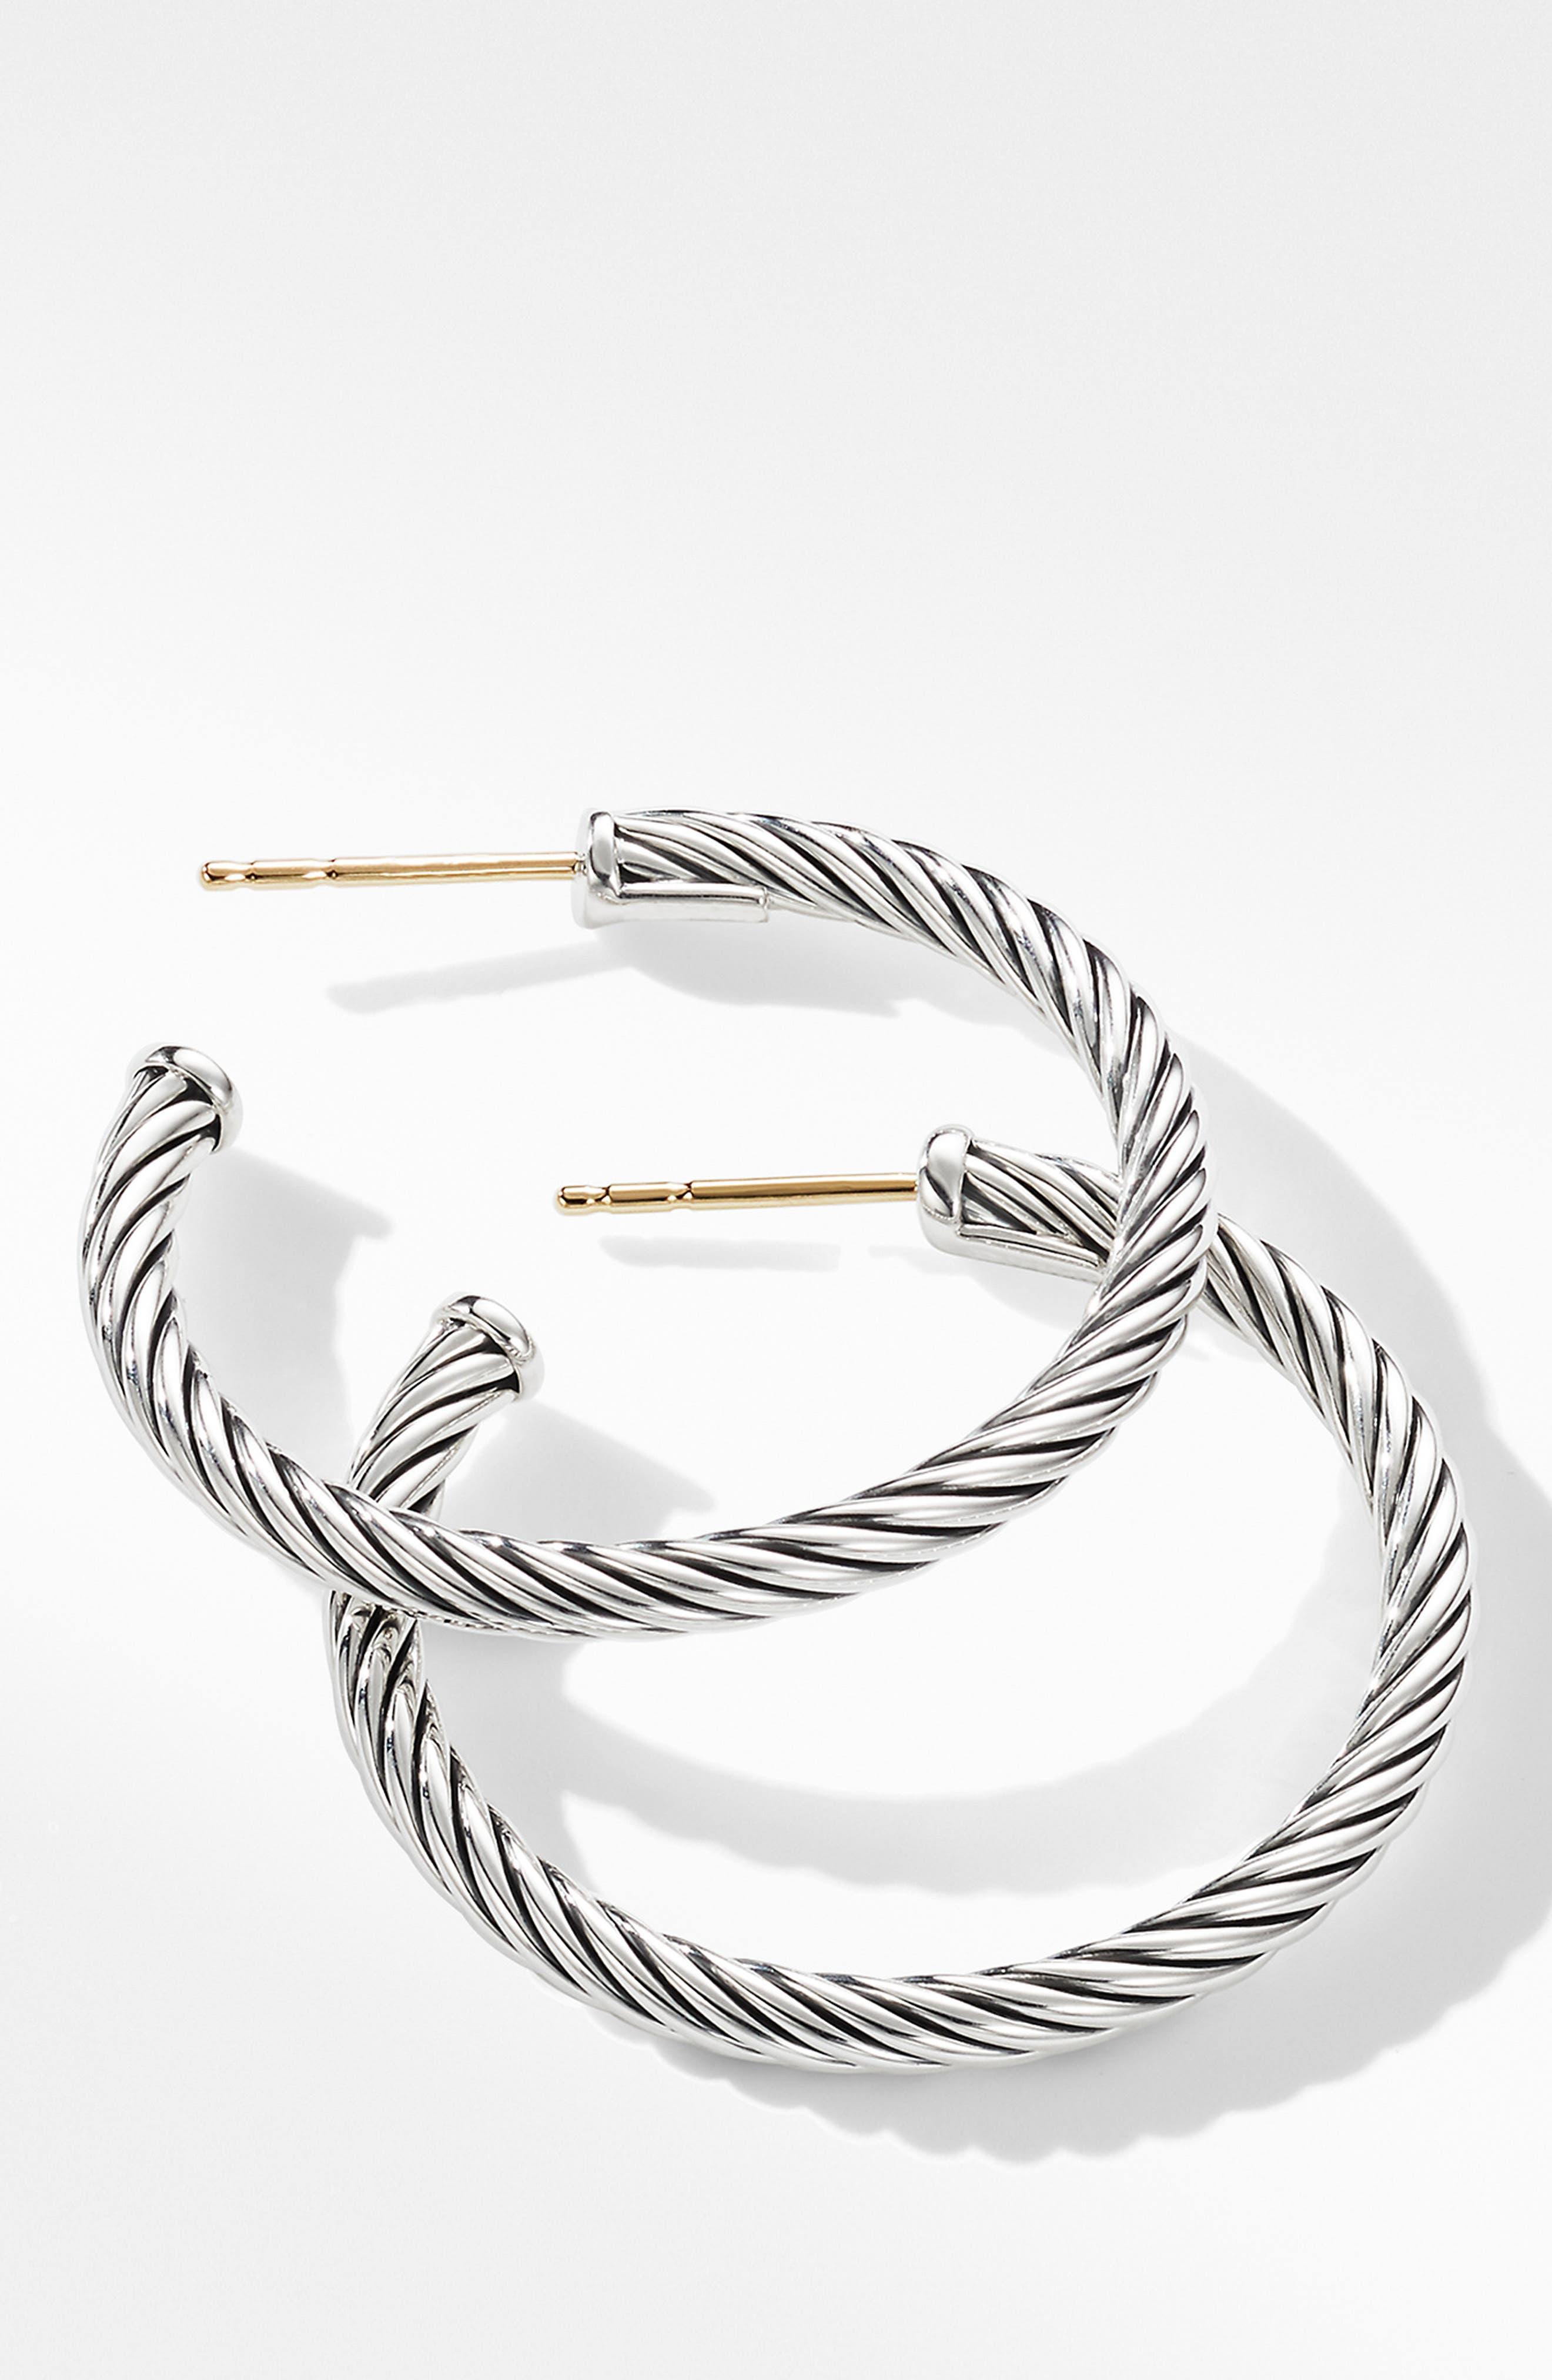 DAVID YURMAN, Cable Loop Hoop Earrings, Alternate thumbnail 2, color, SILVER